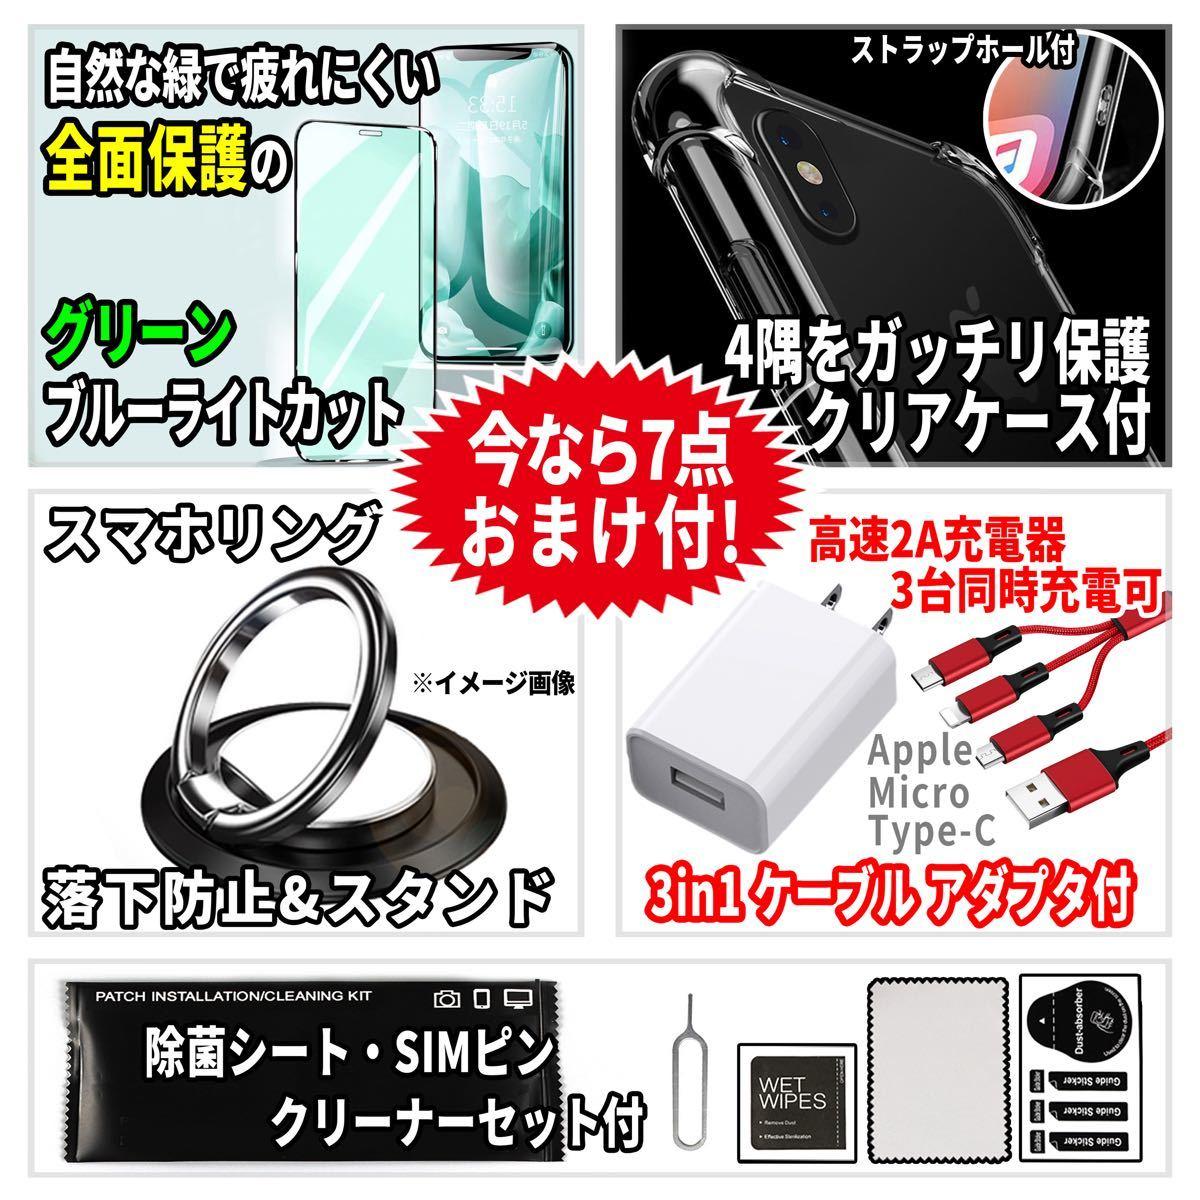 SIMフリー iPhone11ProMax 512GB 276 ゴールド 電池良好 完全動作品_画像2